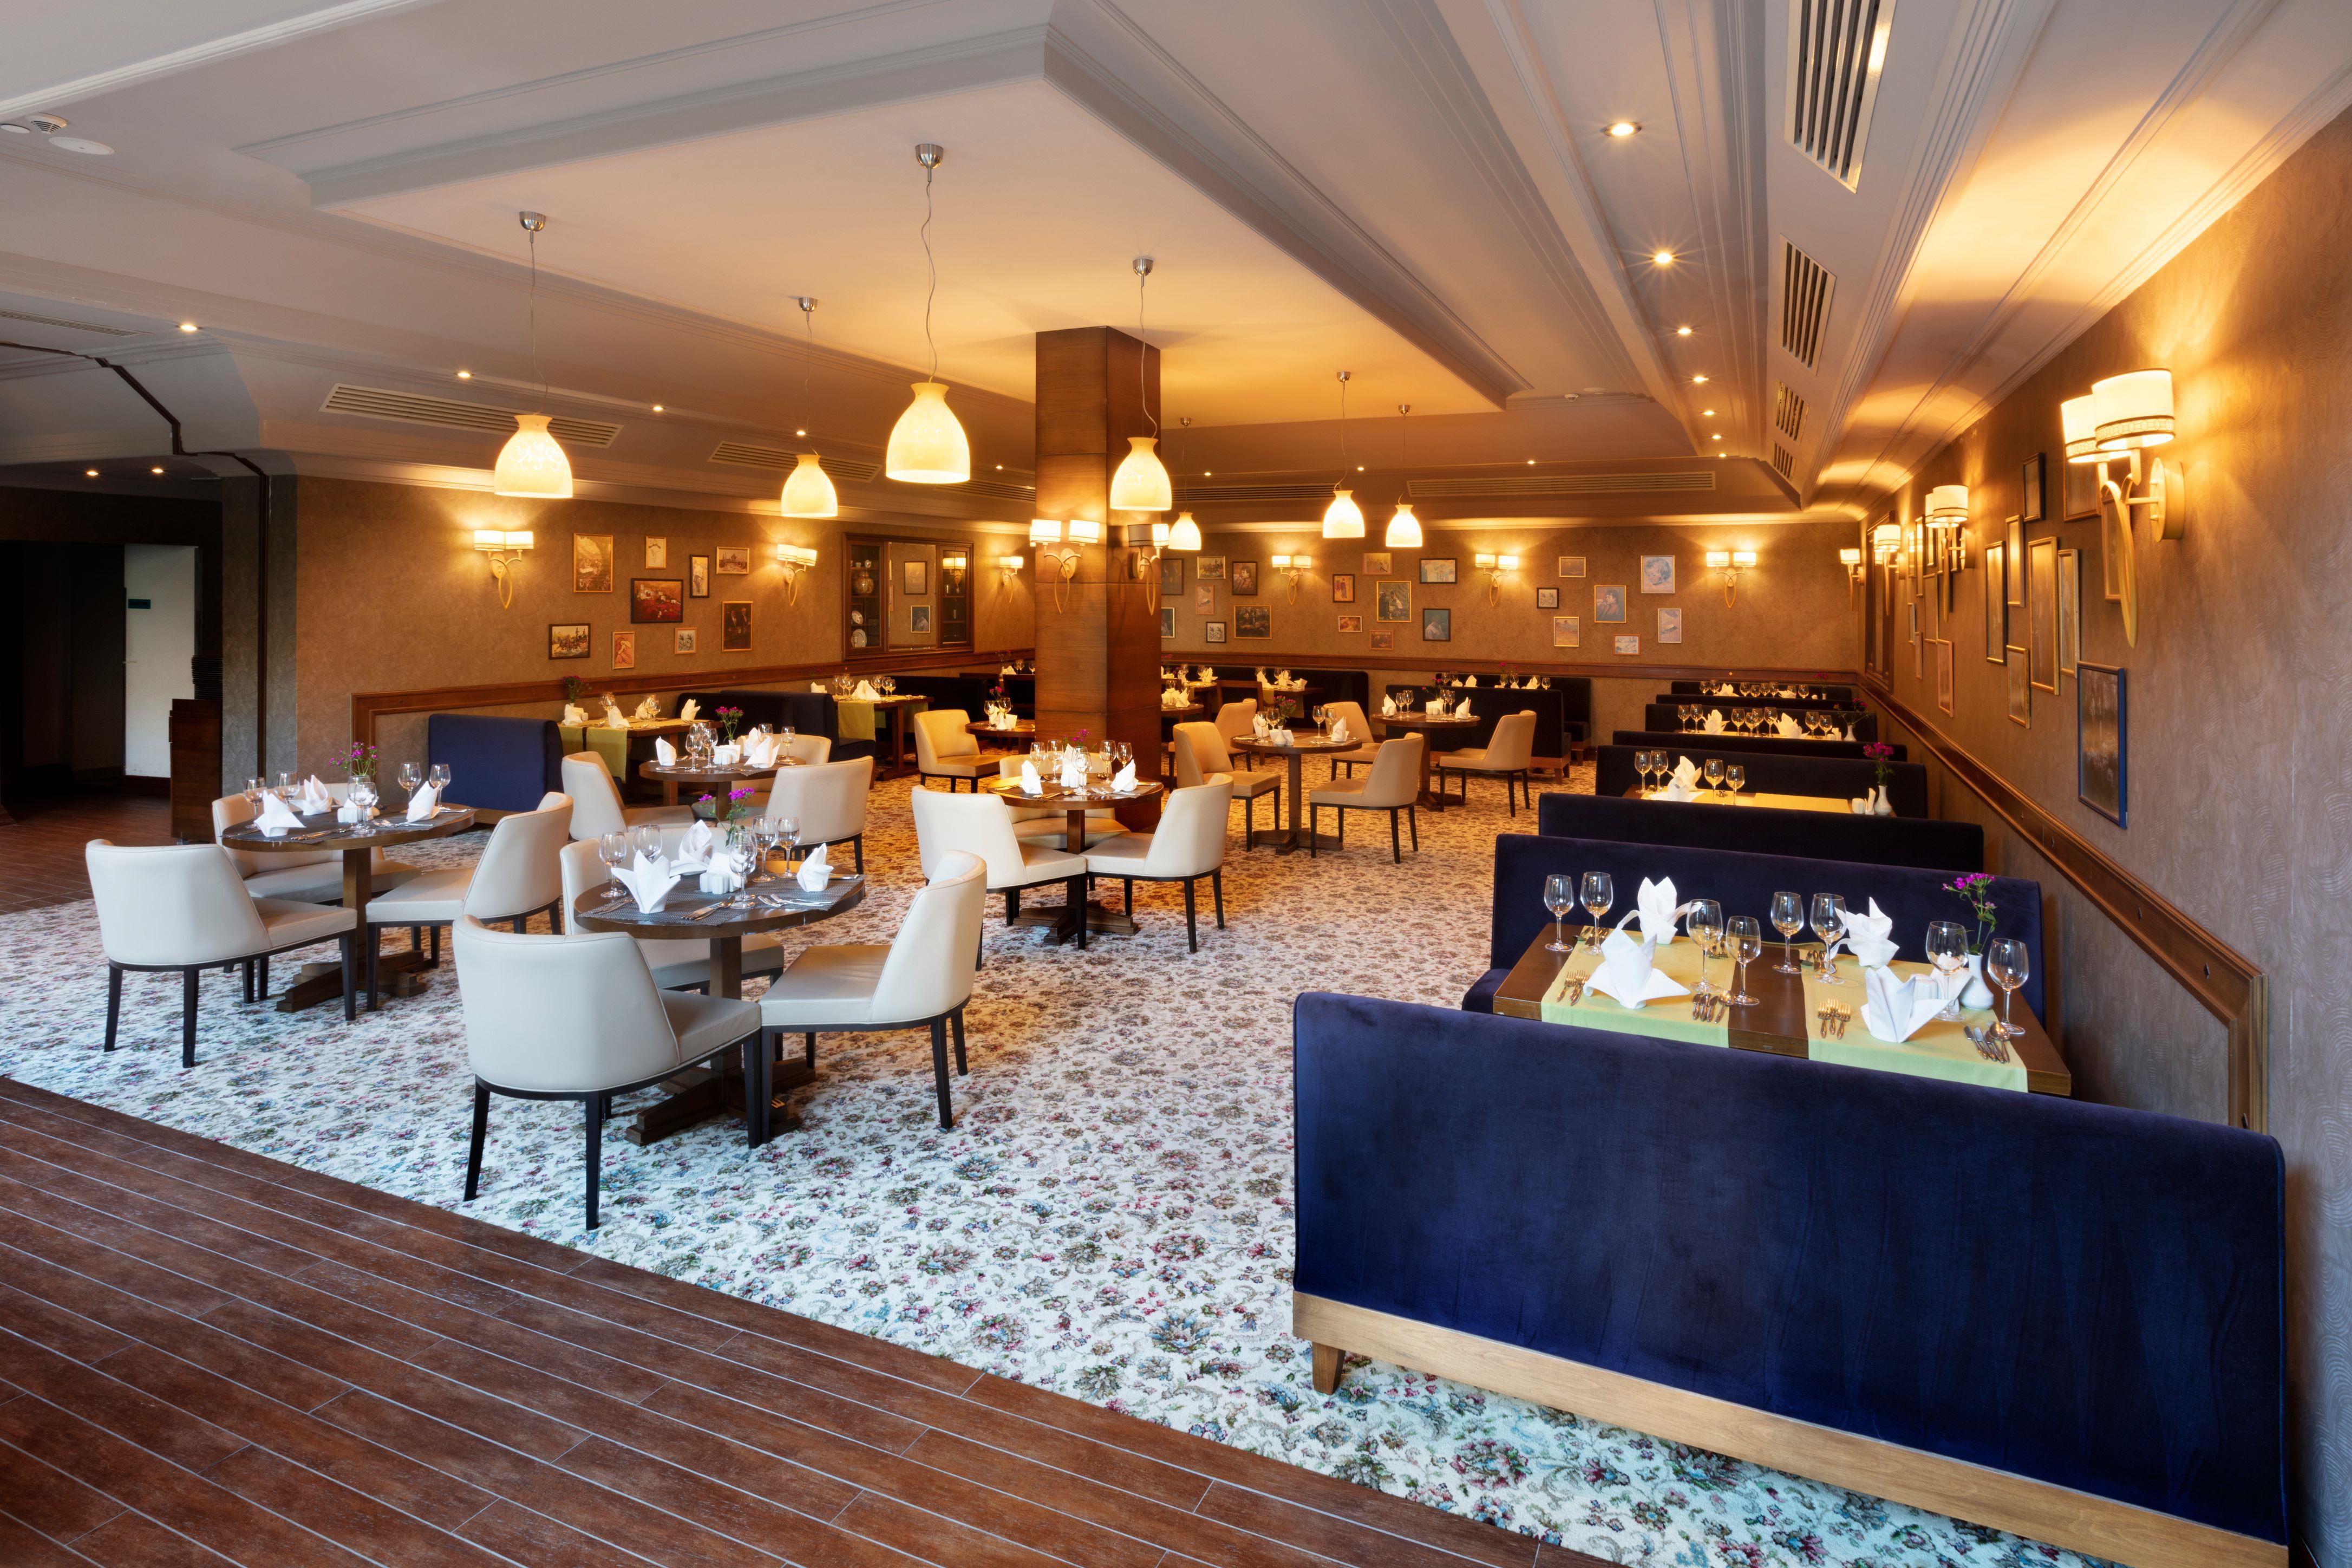 http://www.orextravel.sk/OREX/hotelphotos/zeynep-hotel-general-0020.jpg